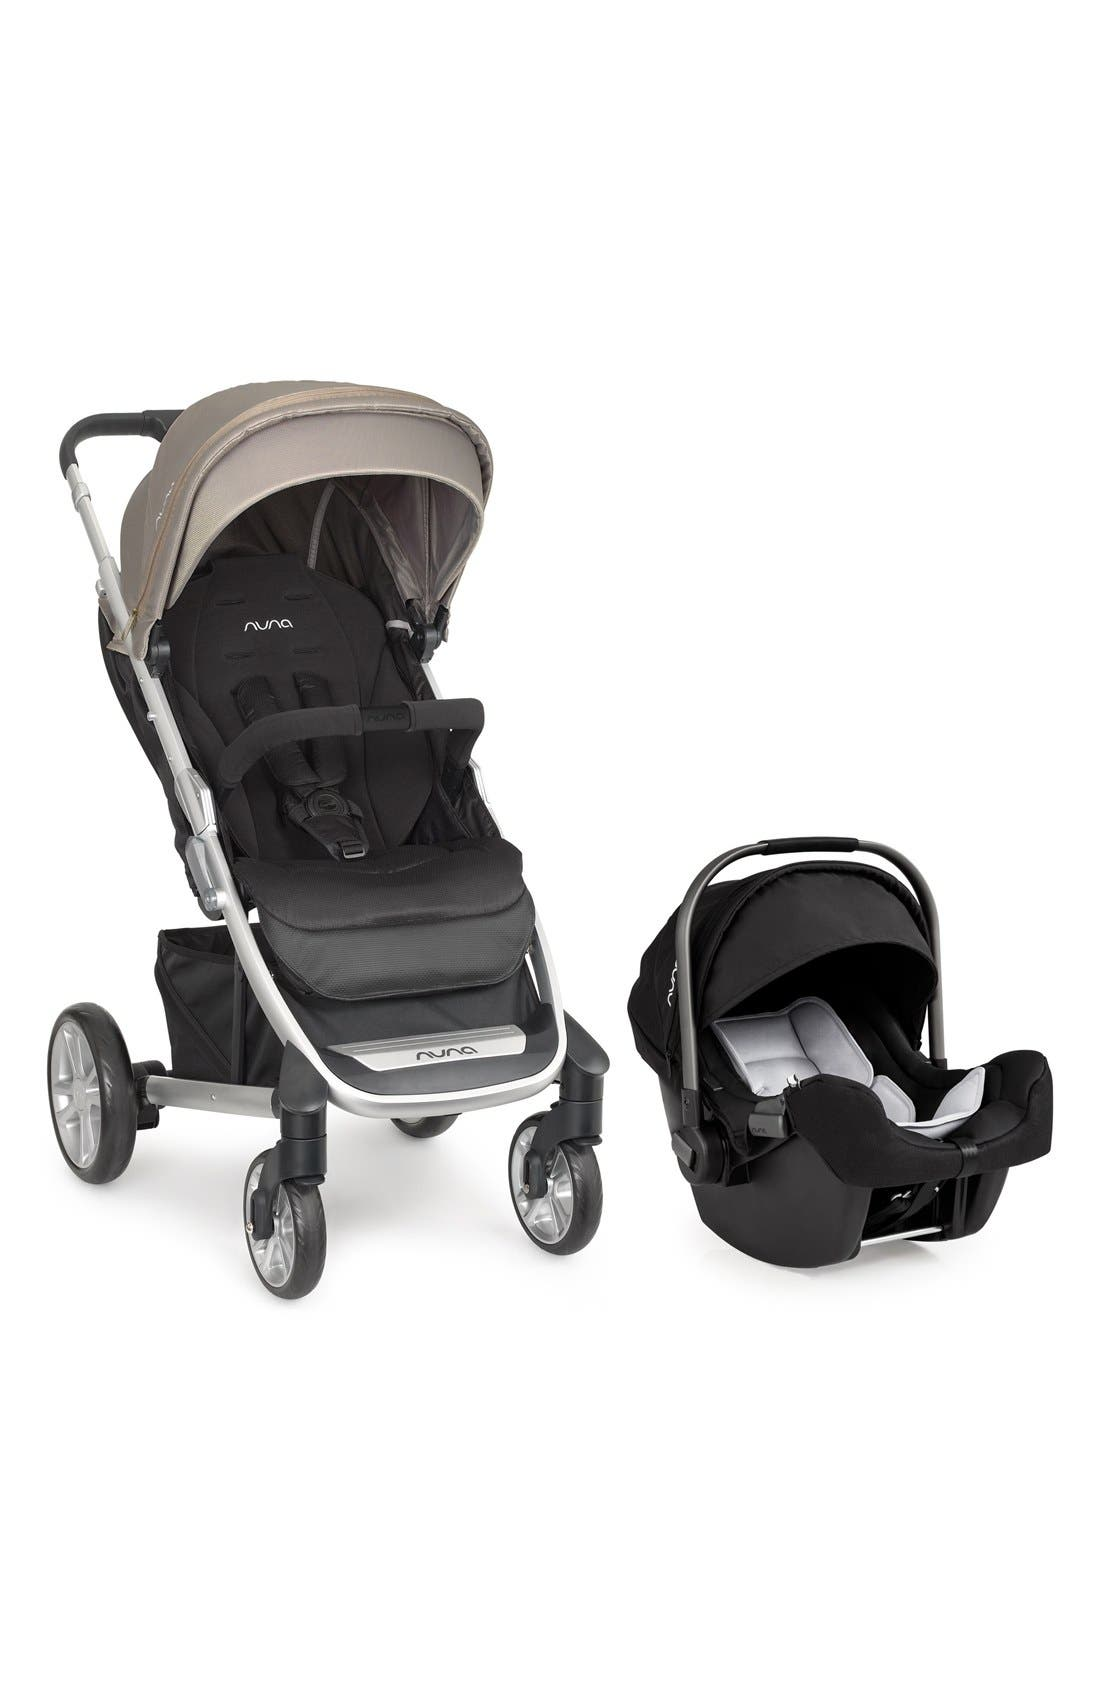 nuna 'TAVO™' Travel System (Stroller, Car Seat & Base)